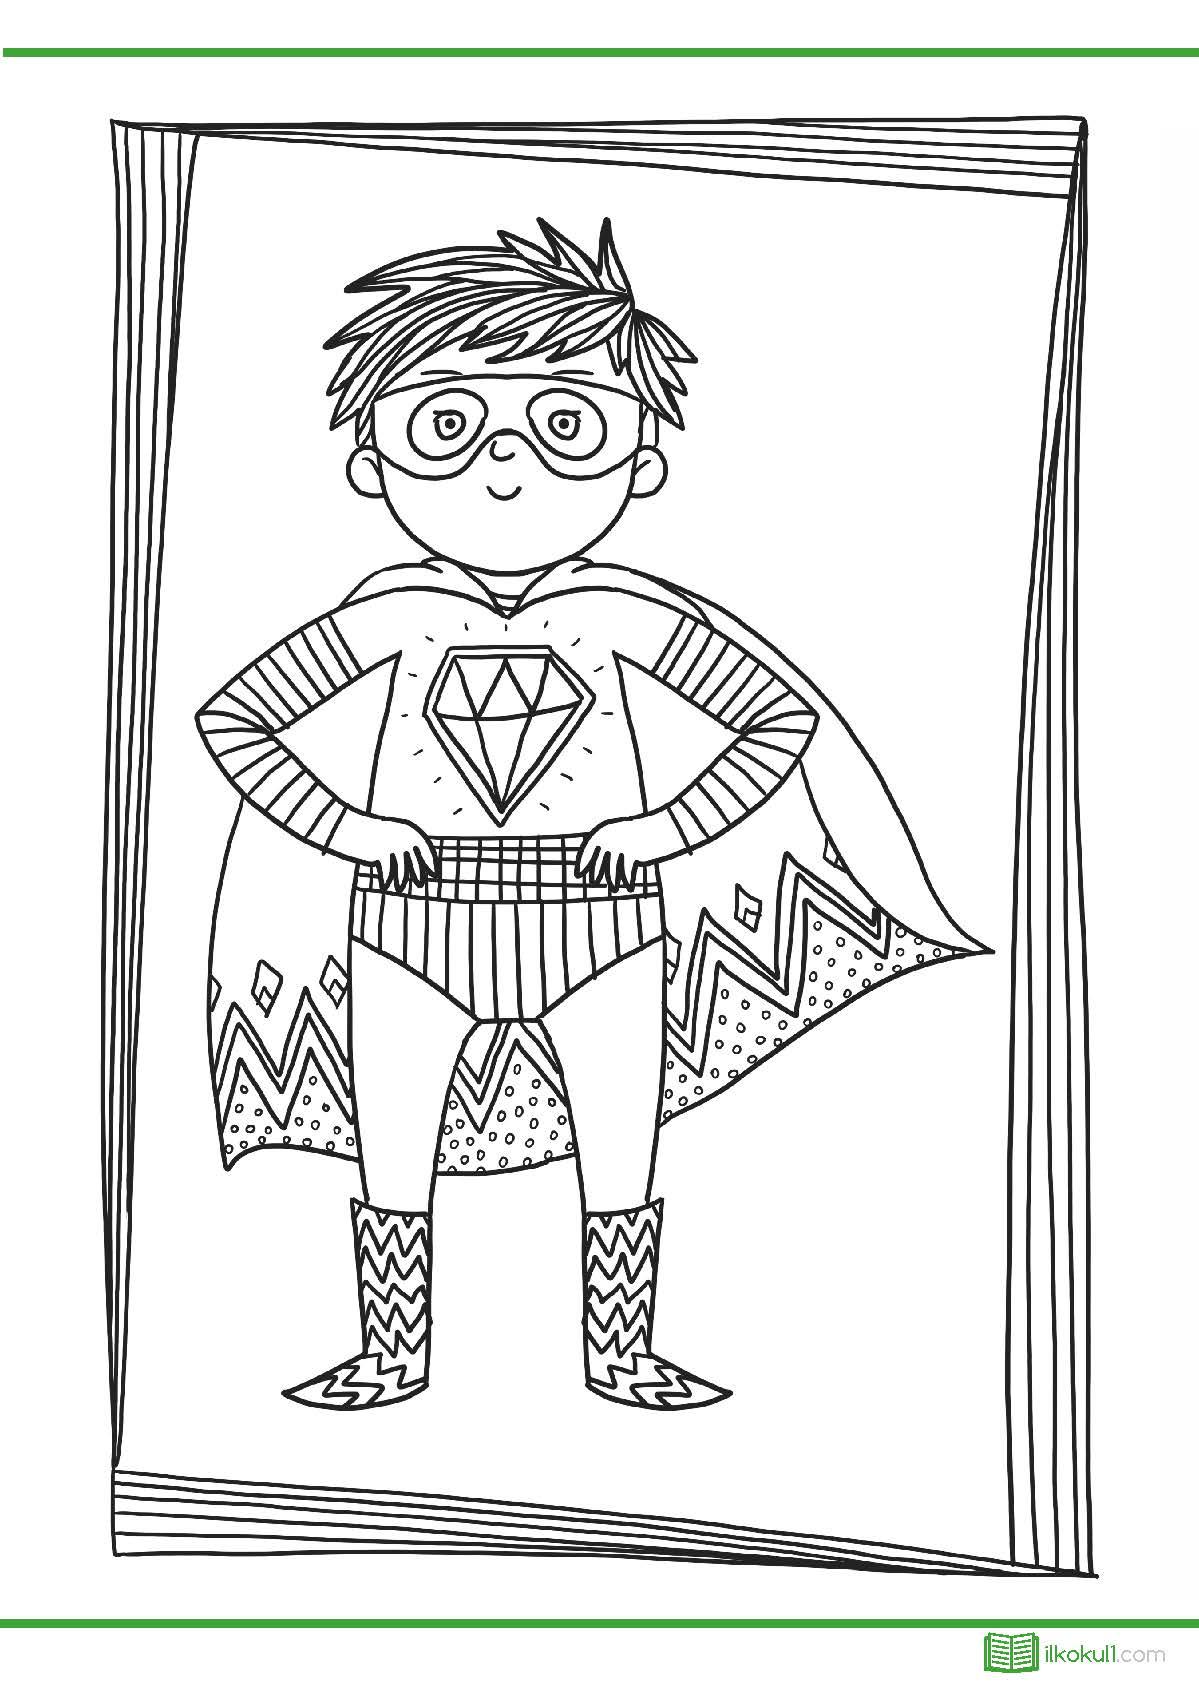 Super Kahraman Detayli Boyama Sayfalari